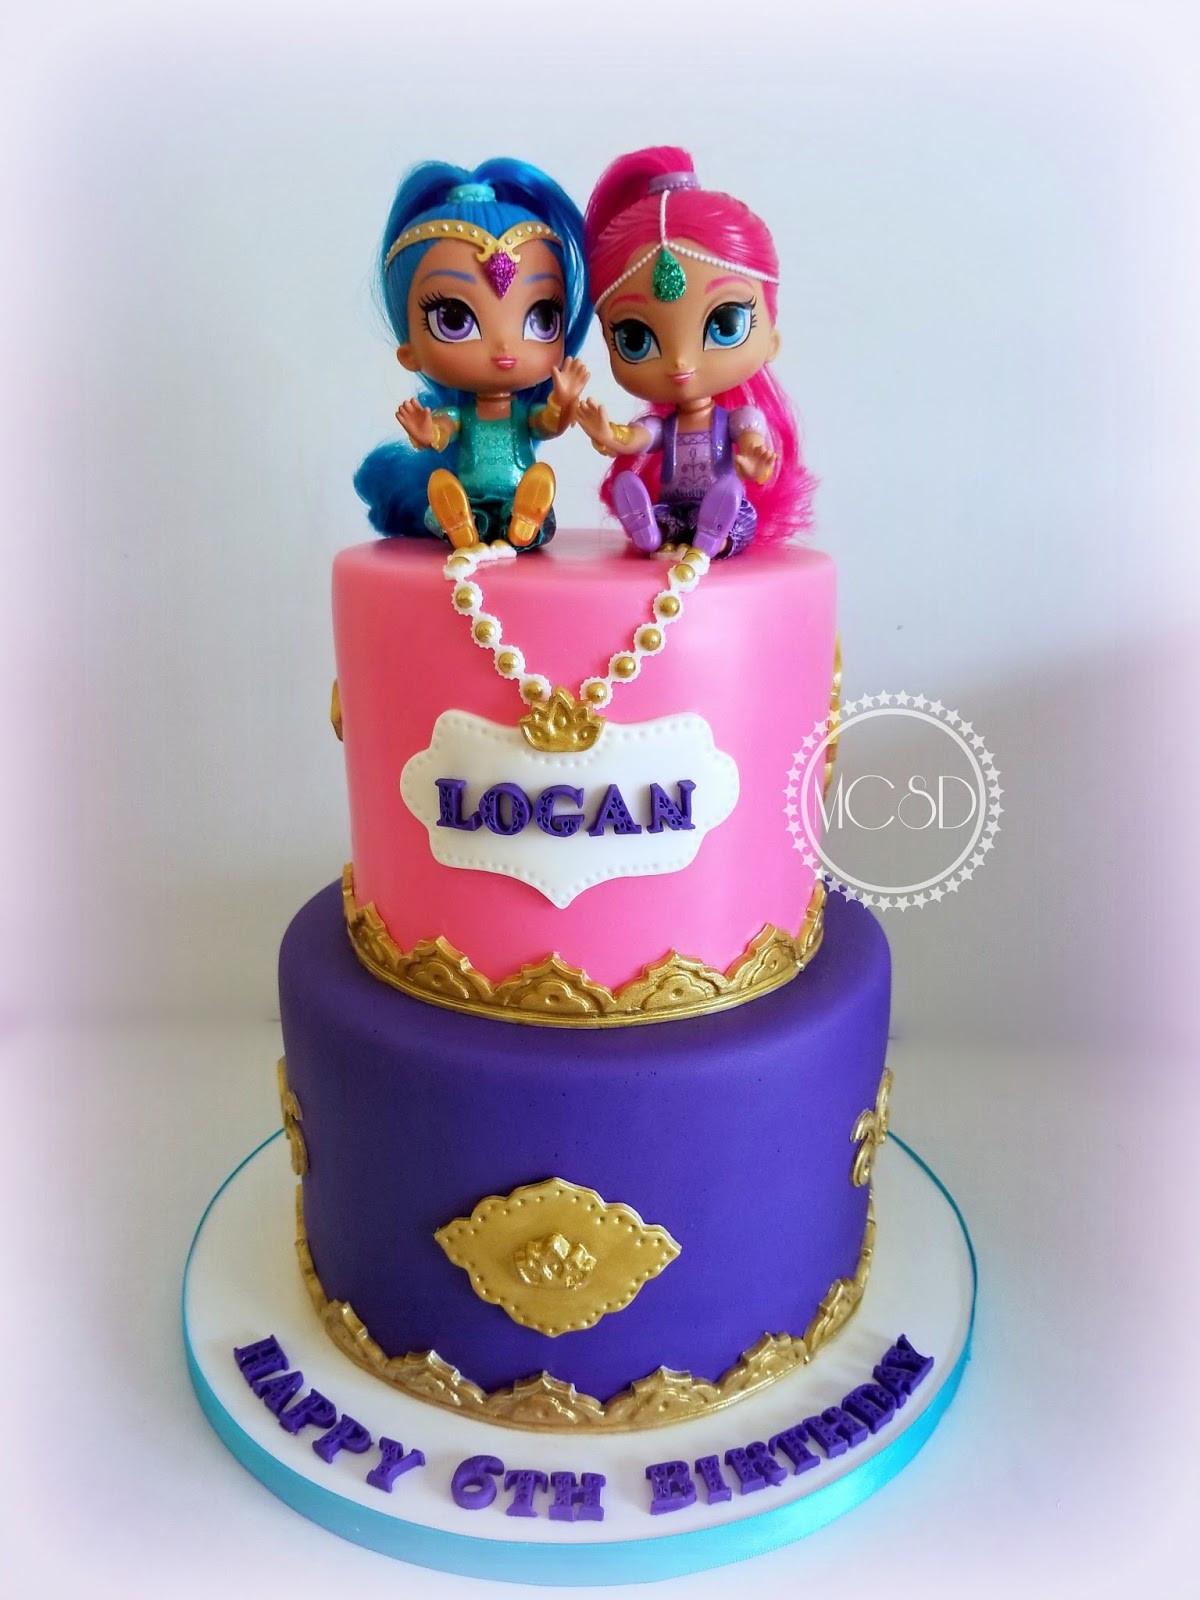 Shimmer And Shine Birthday Cake  MyCakeSweetDreams Shimmer and Shine Birthday Cake